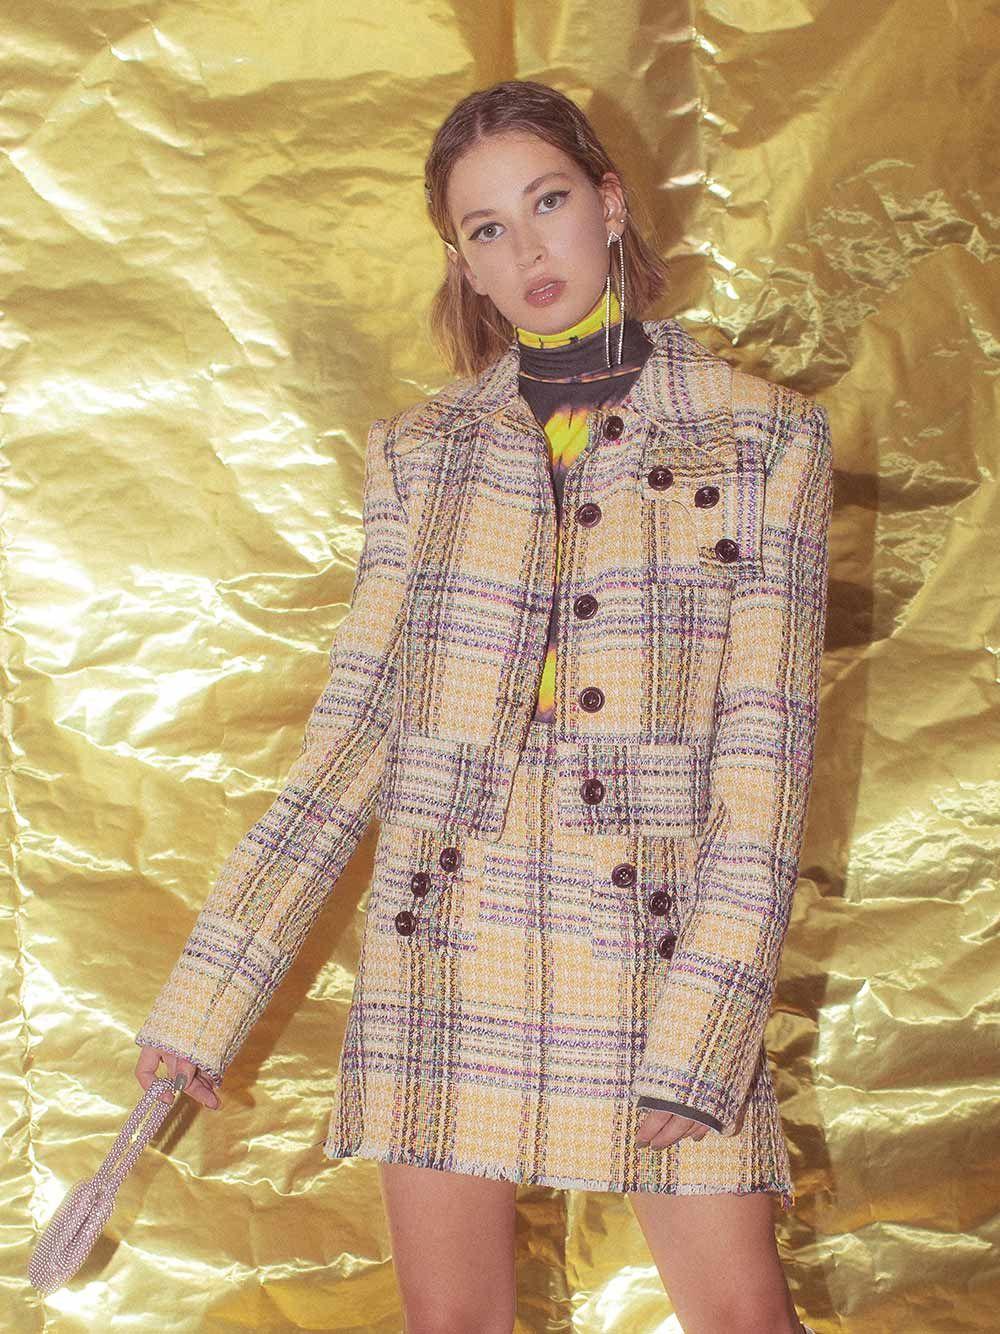 Amber Tie-dye Turtleneck | Carolina Machado